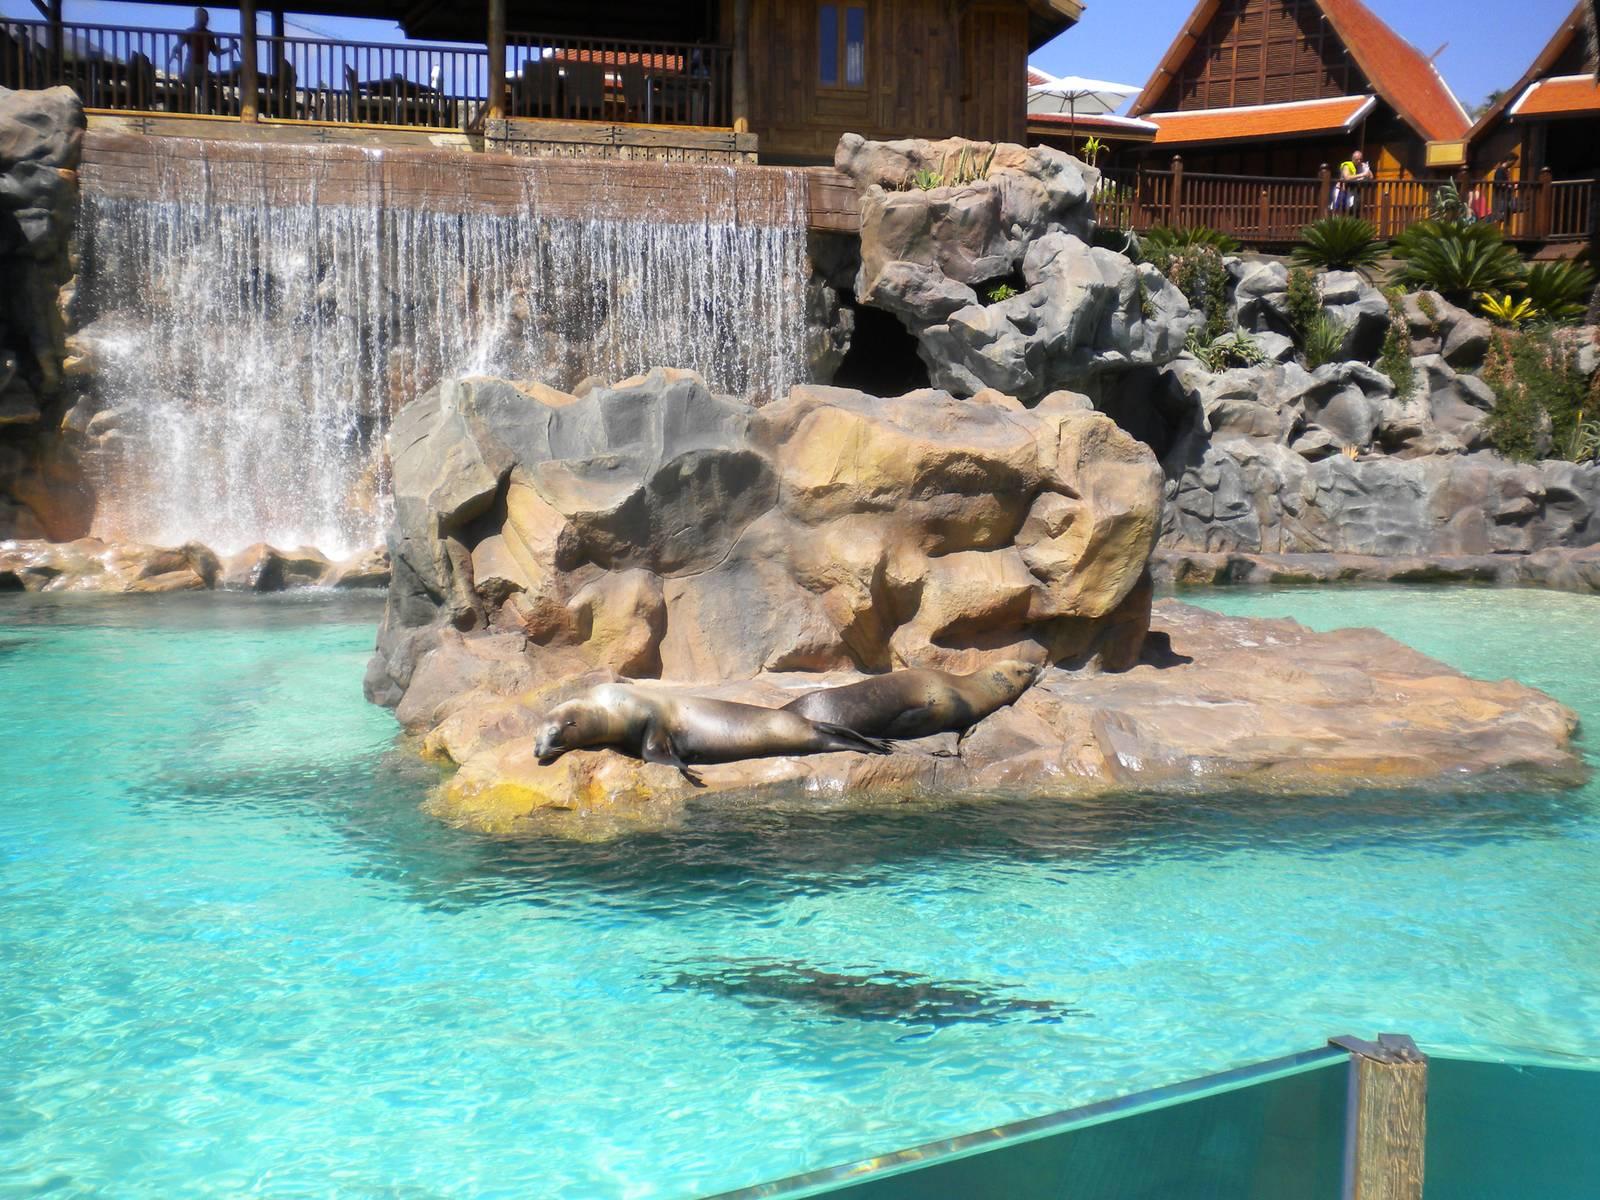 siam park15 Siam Park More Than a Water Park